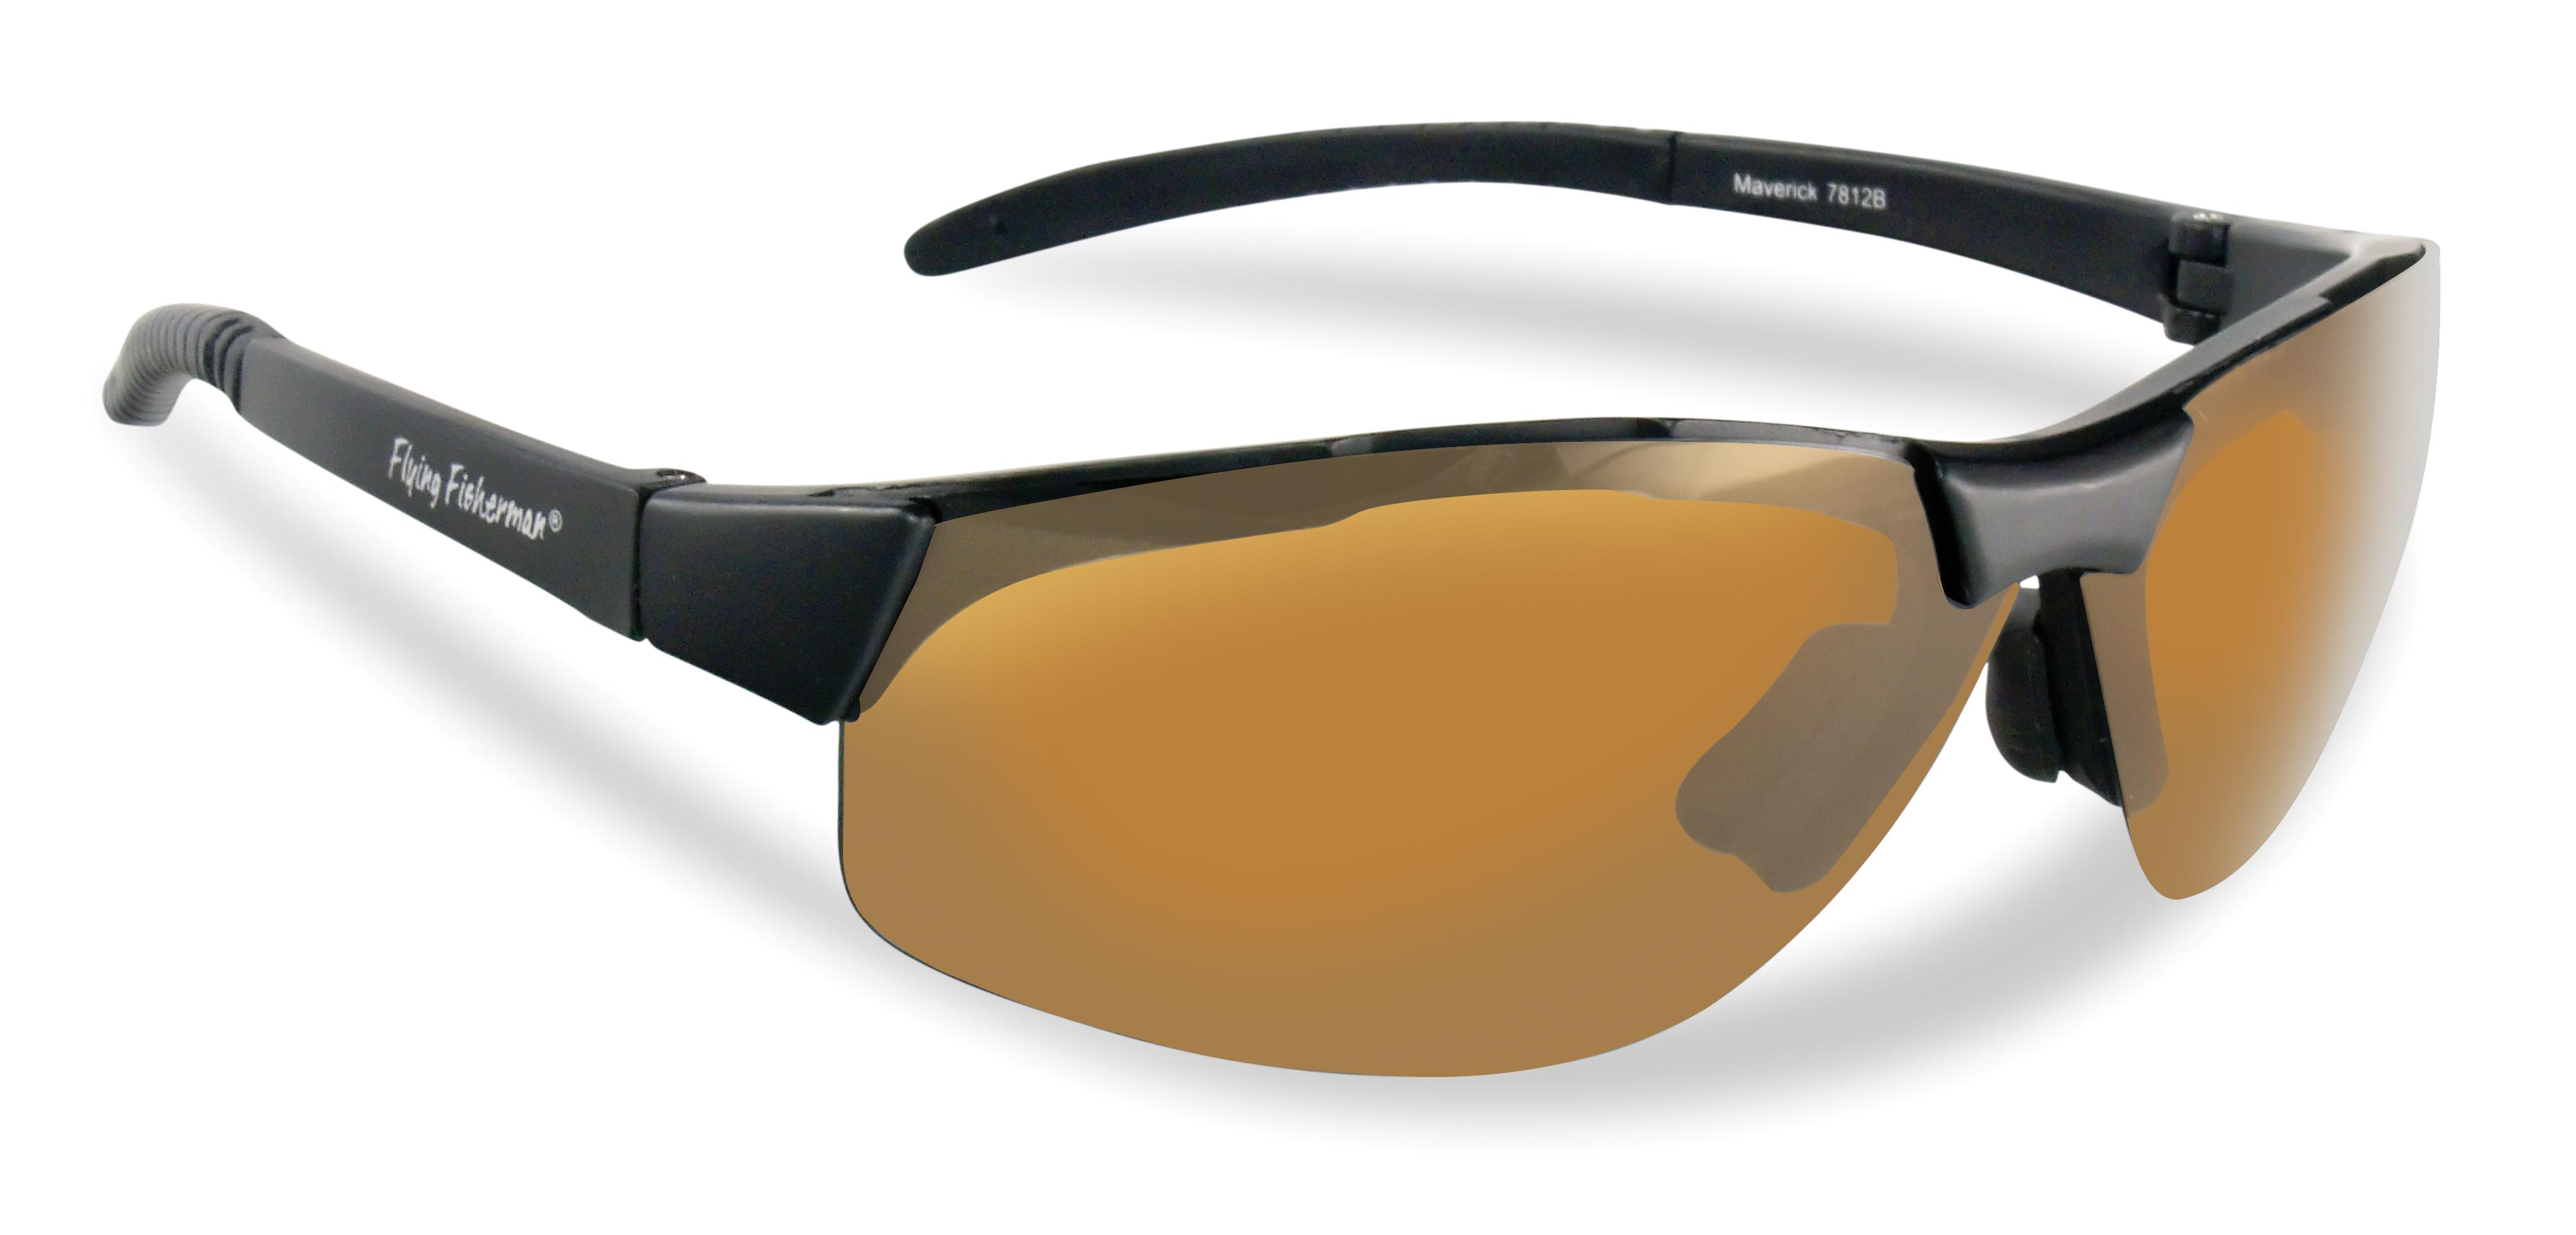 Black Frame Amber Lens Bifocal Flying Fisherman Cali Polarized Sunglasses